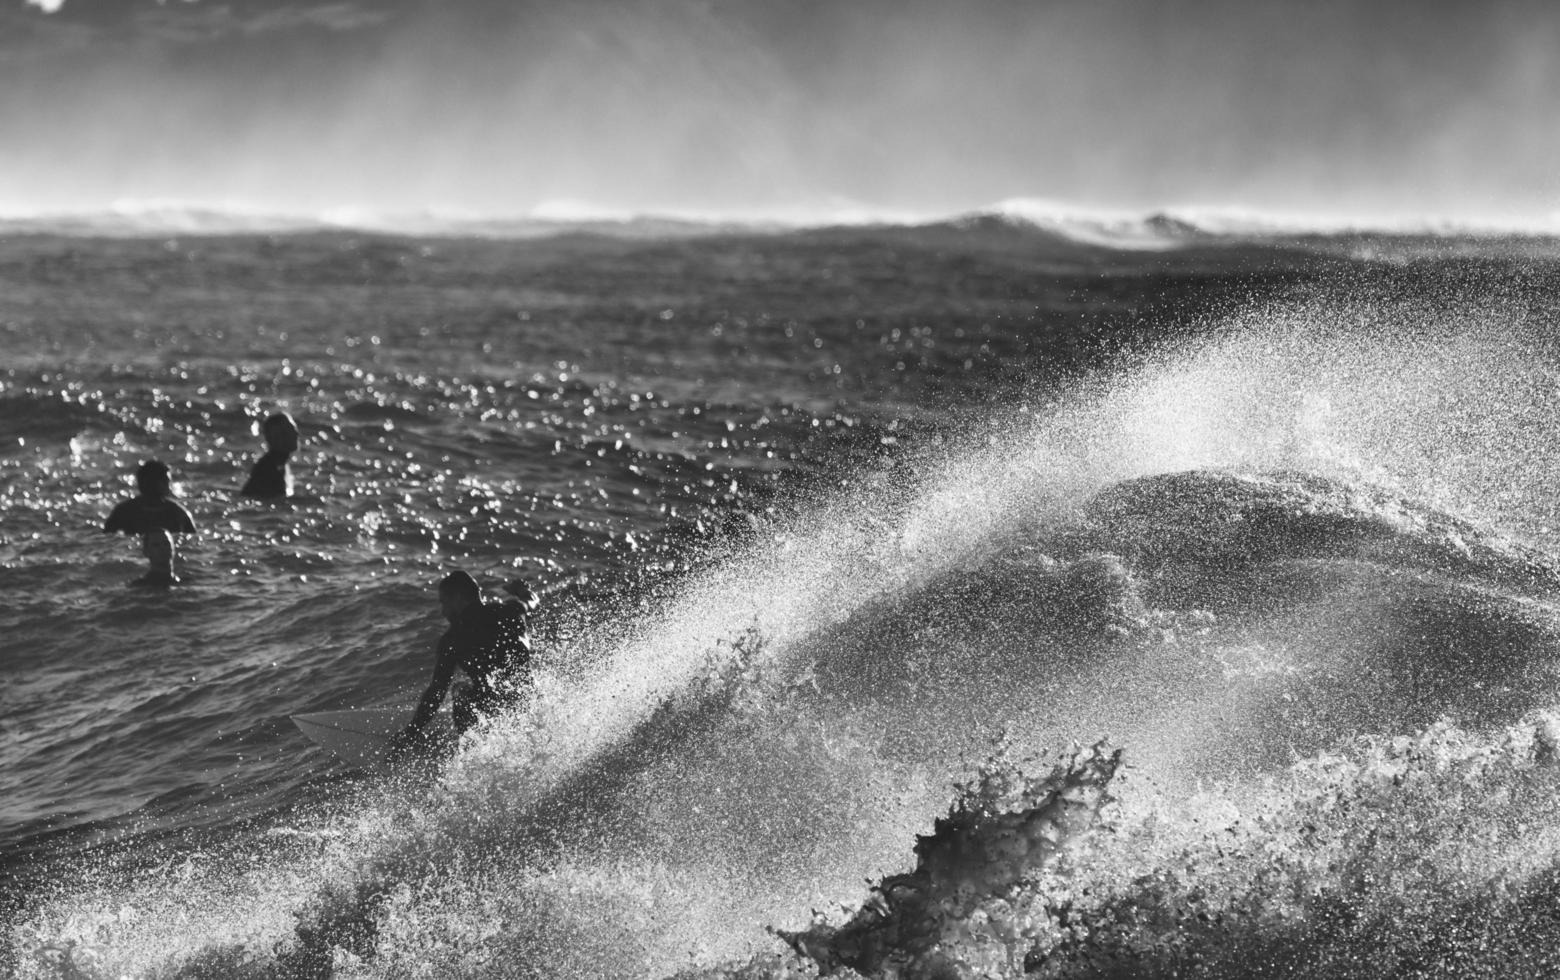 Sydney, Australia, 2020 - Escala de grises de personas navegando sobre olas foto